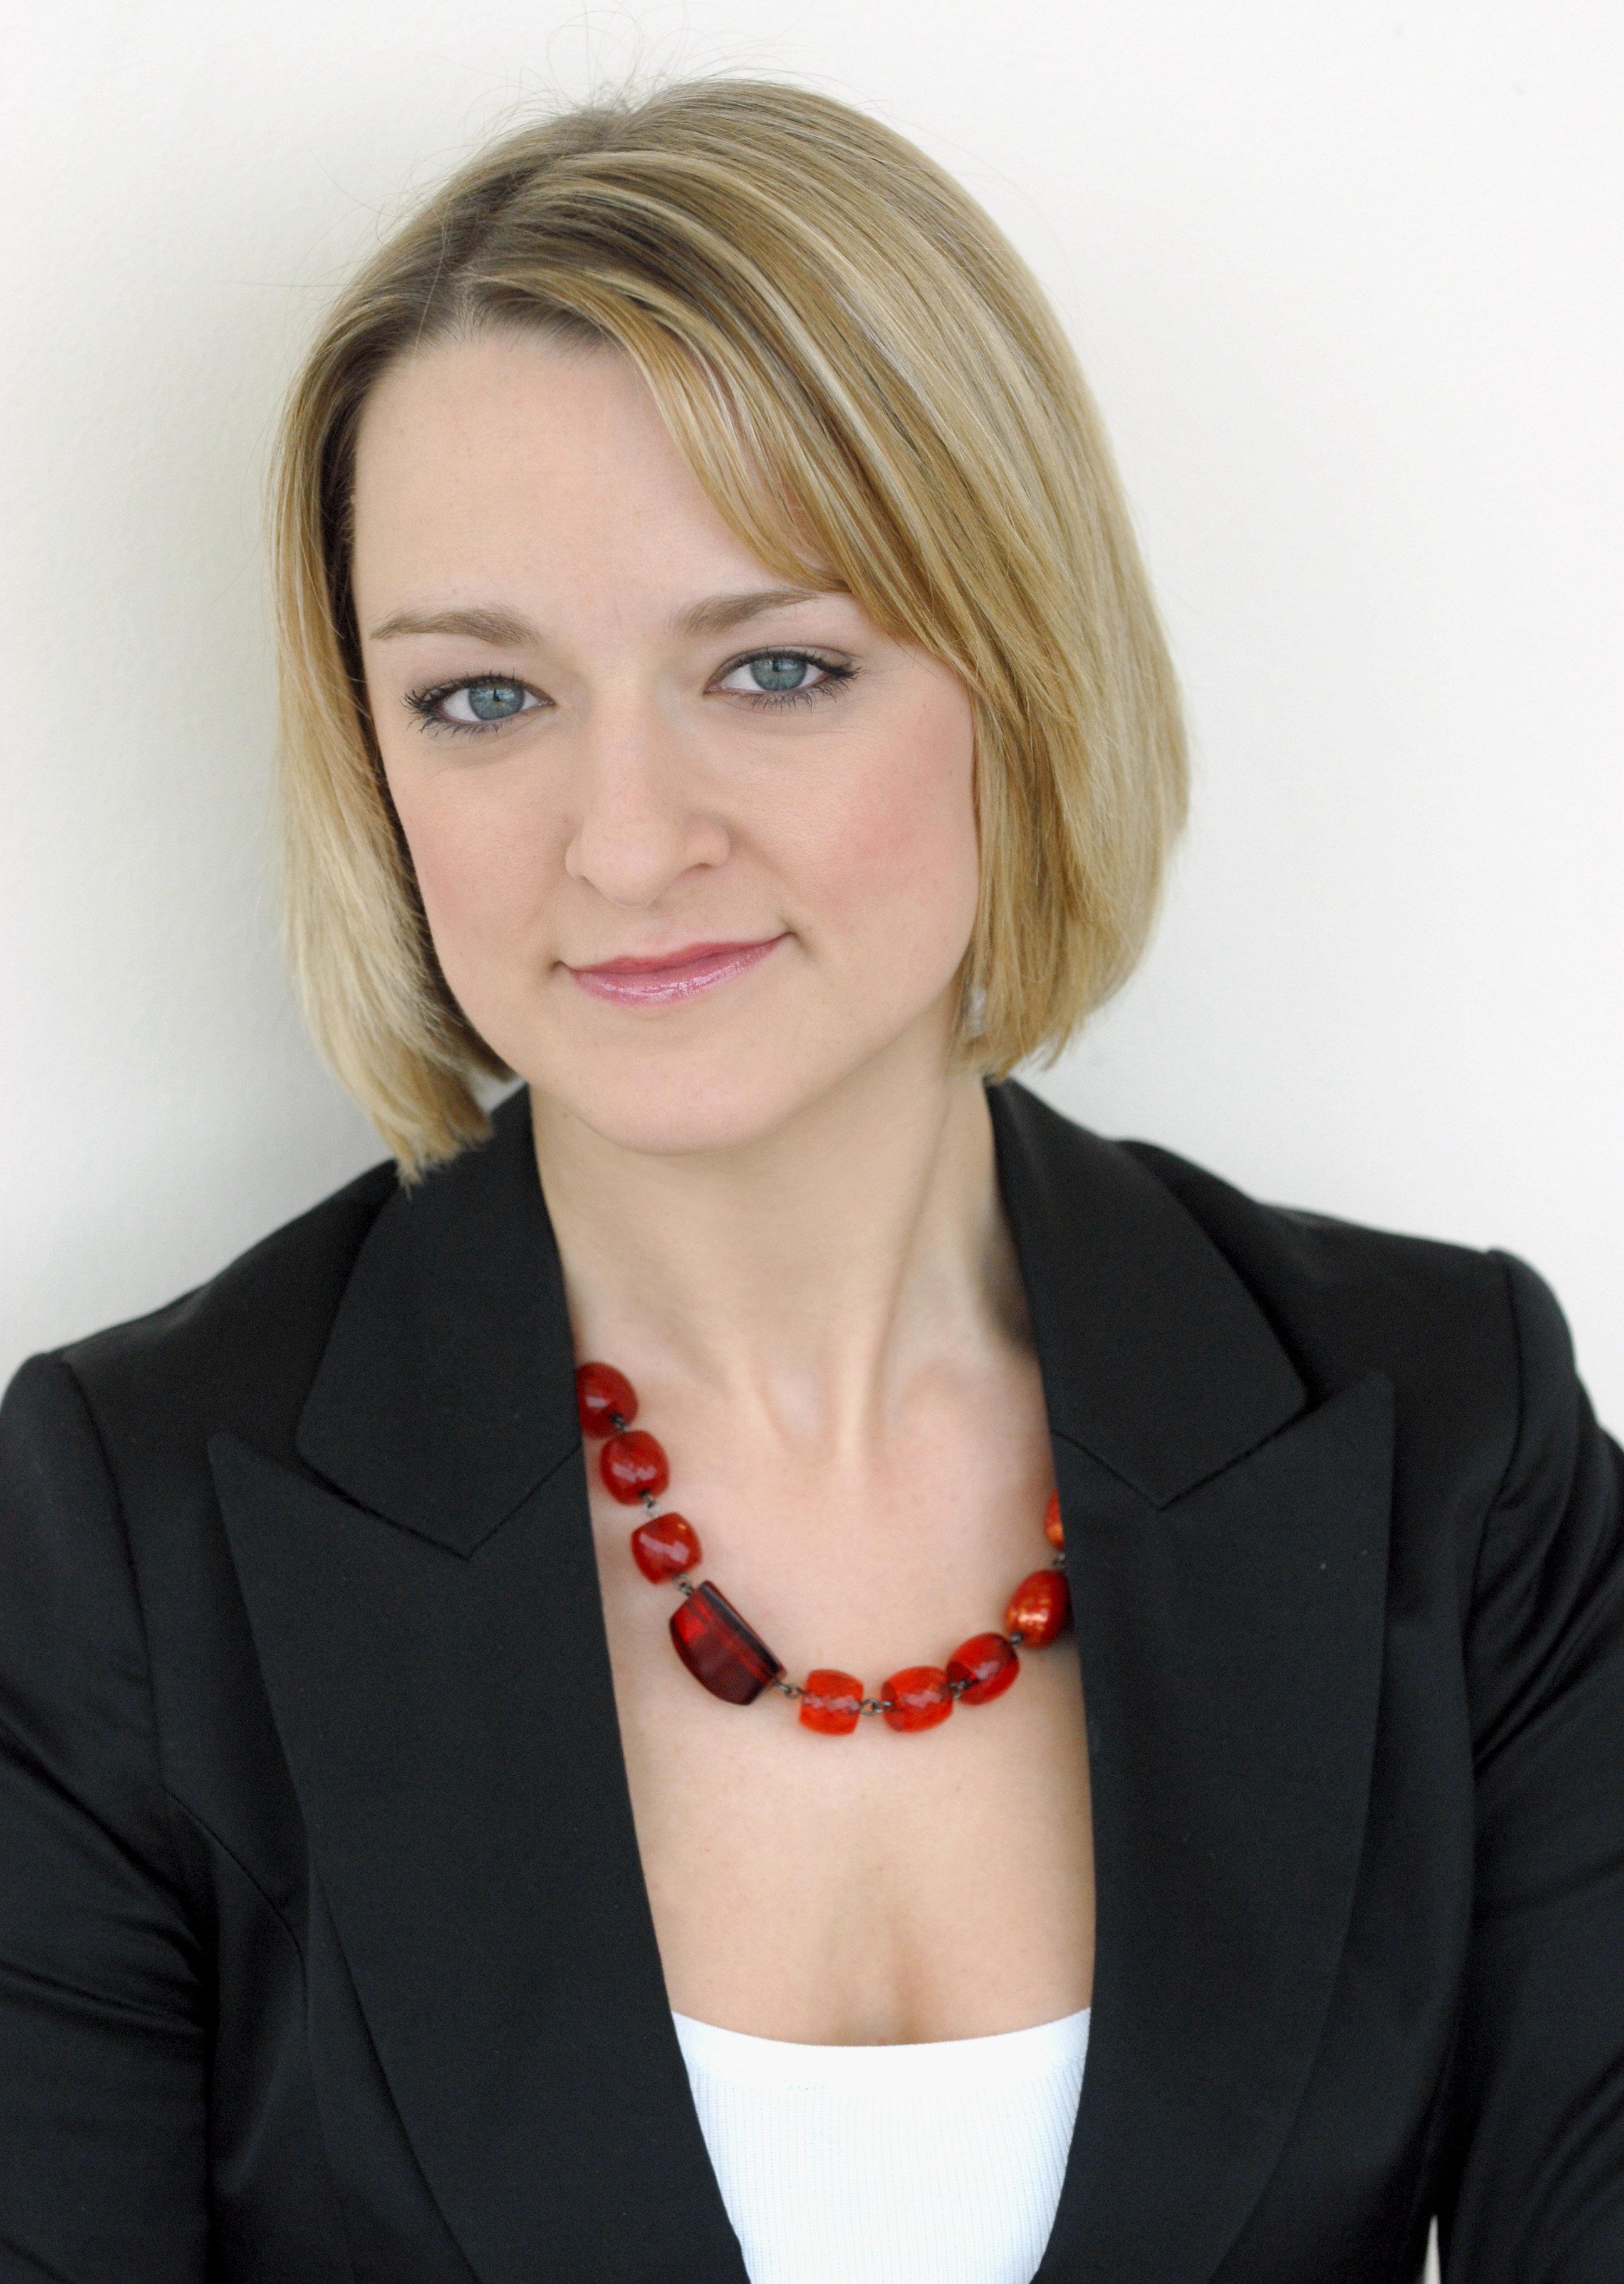 BBC political editor Laura